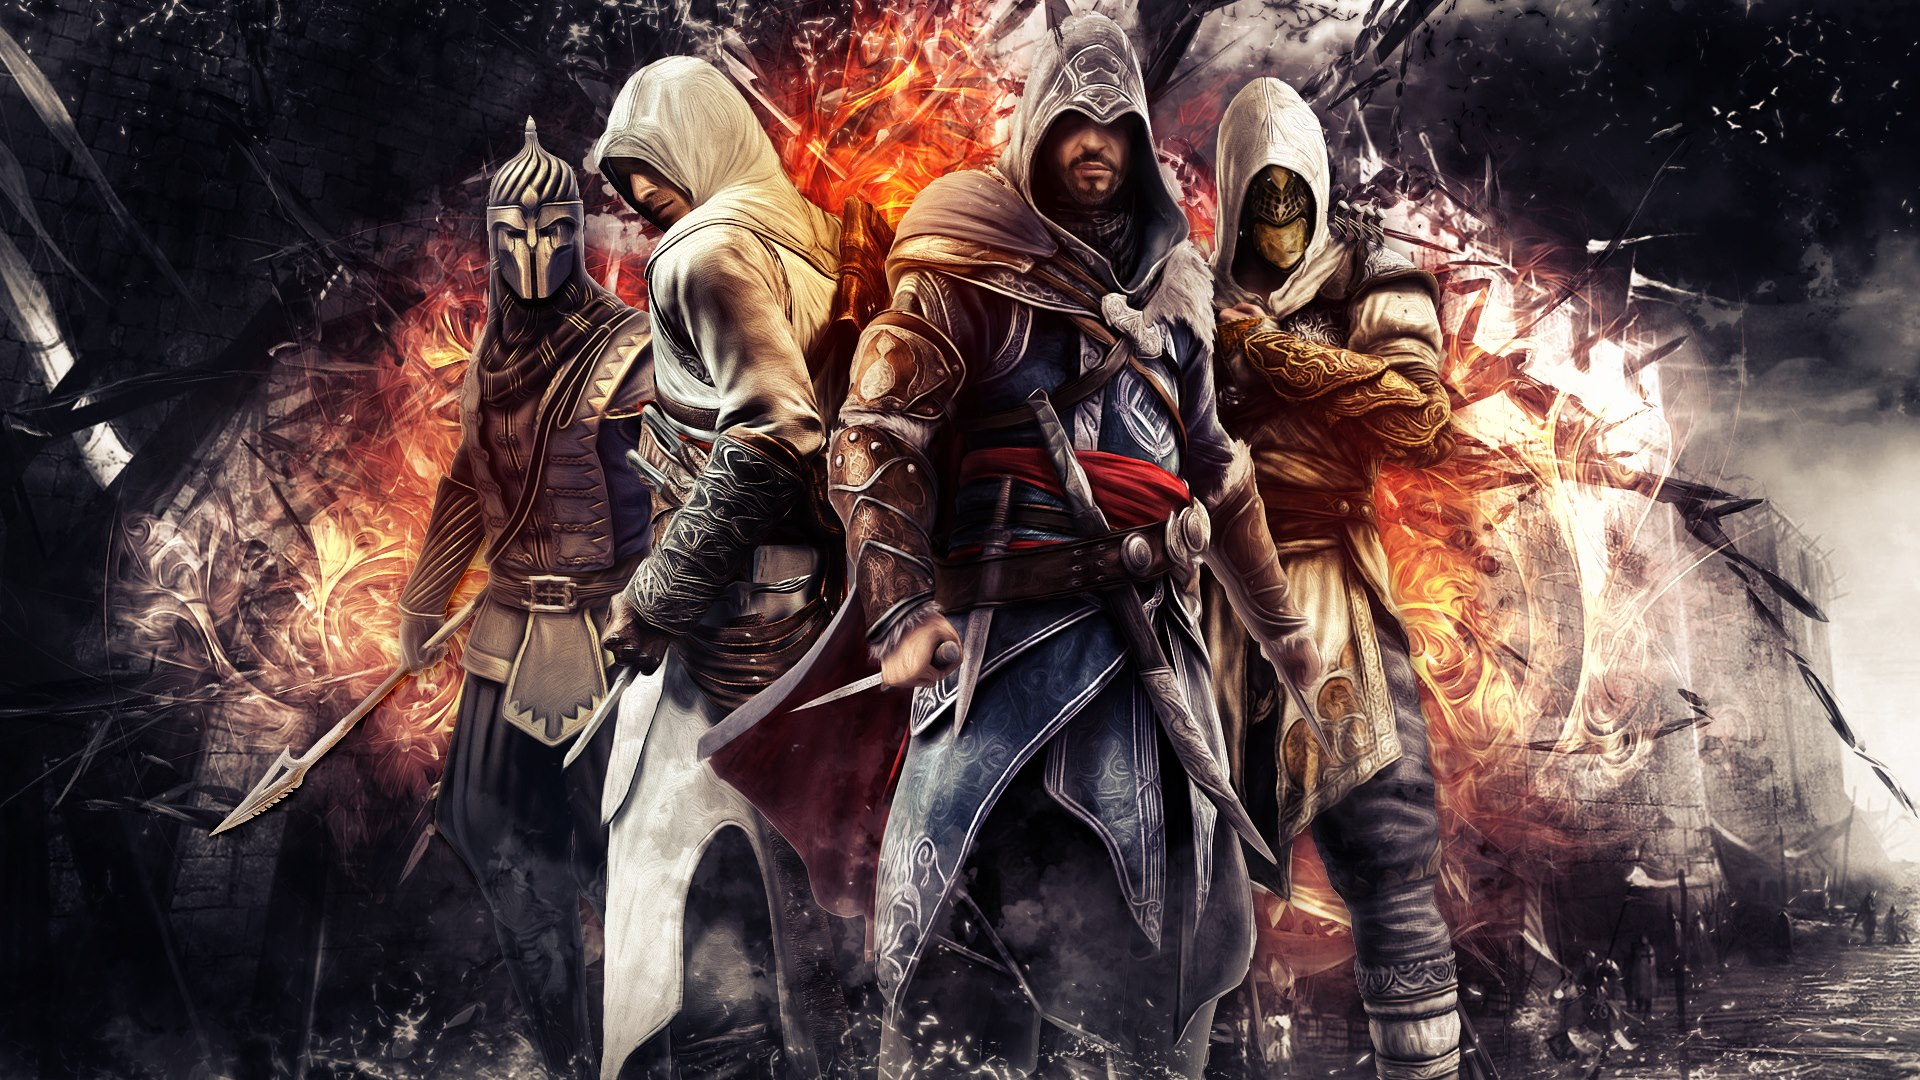 Assassins Creed Ezio Altair Epic Wallpaper   ForWallpapercom 1920x1080